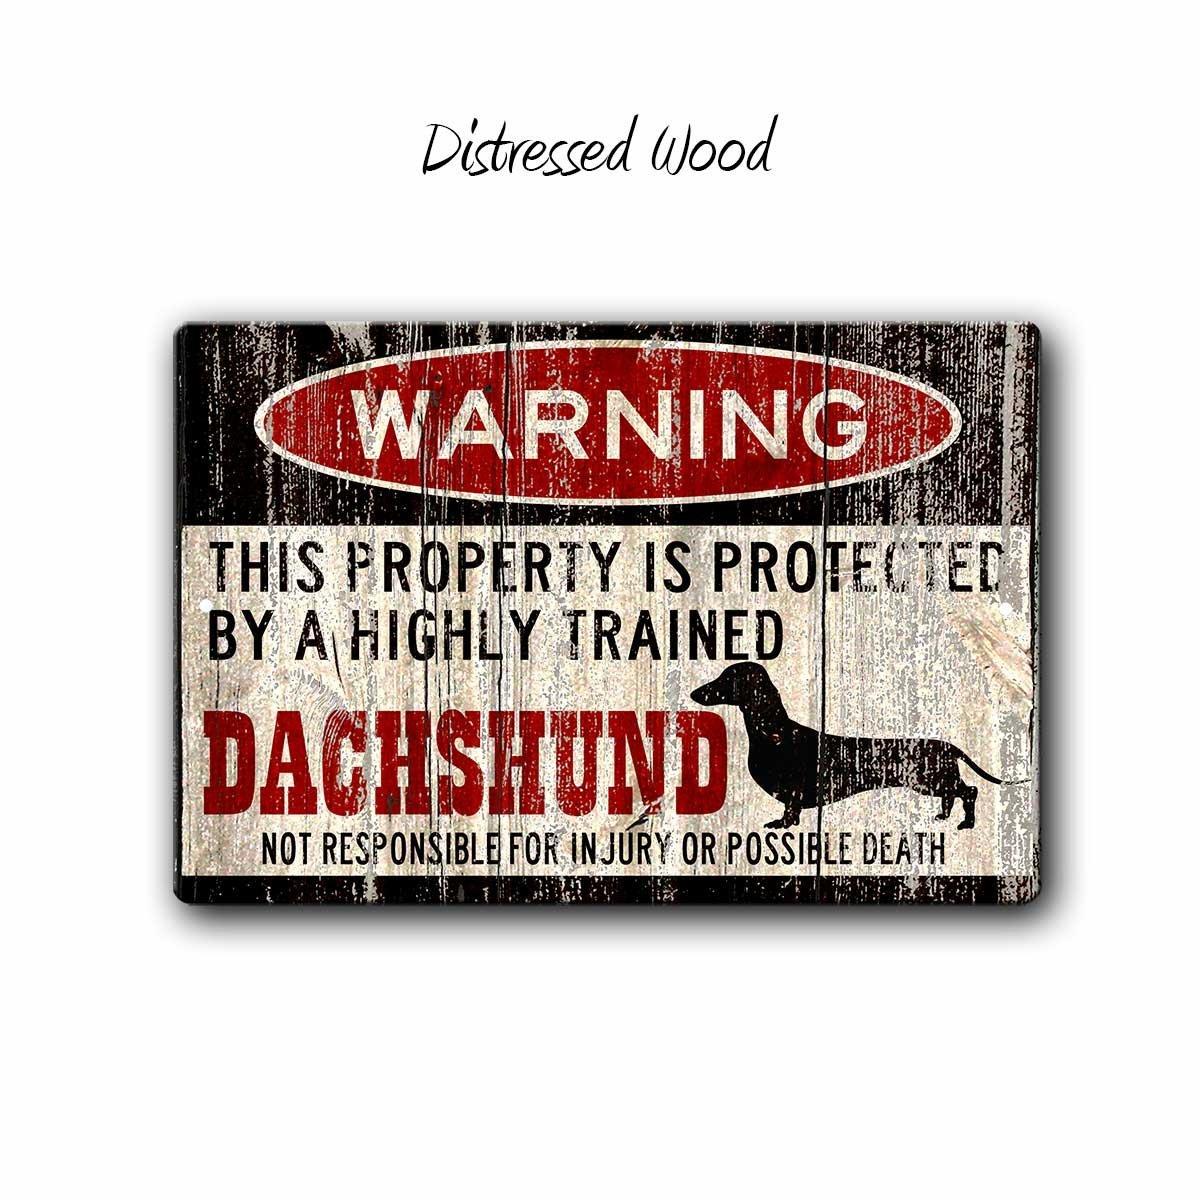 Dachshund Sign, Funny dog warning sign, Dachshund Gift, Dachshund owner gift, Dachshund Home Decor, 12 x 8 inch Aluminum Warning Sign